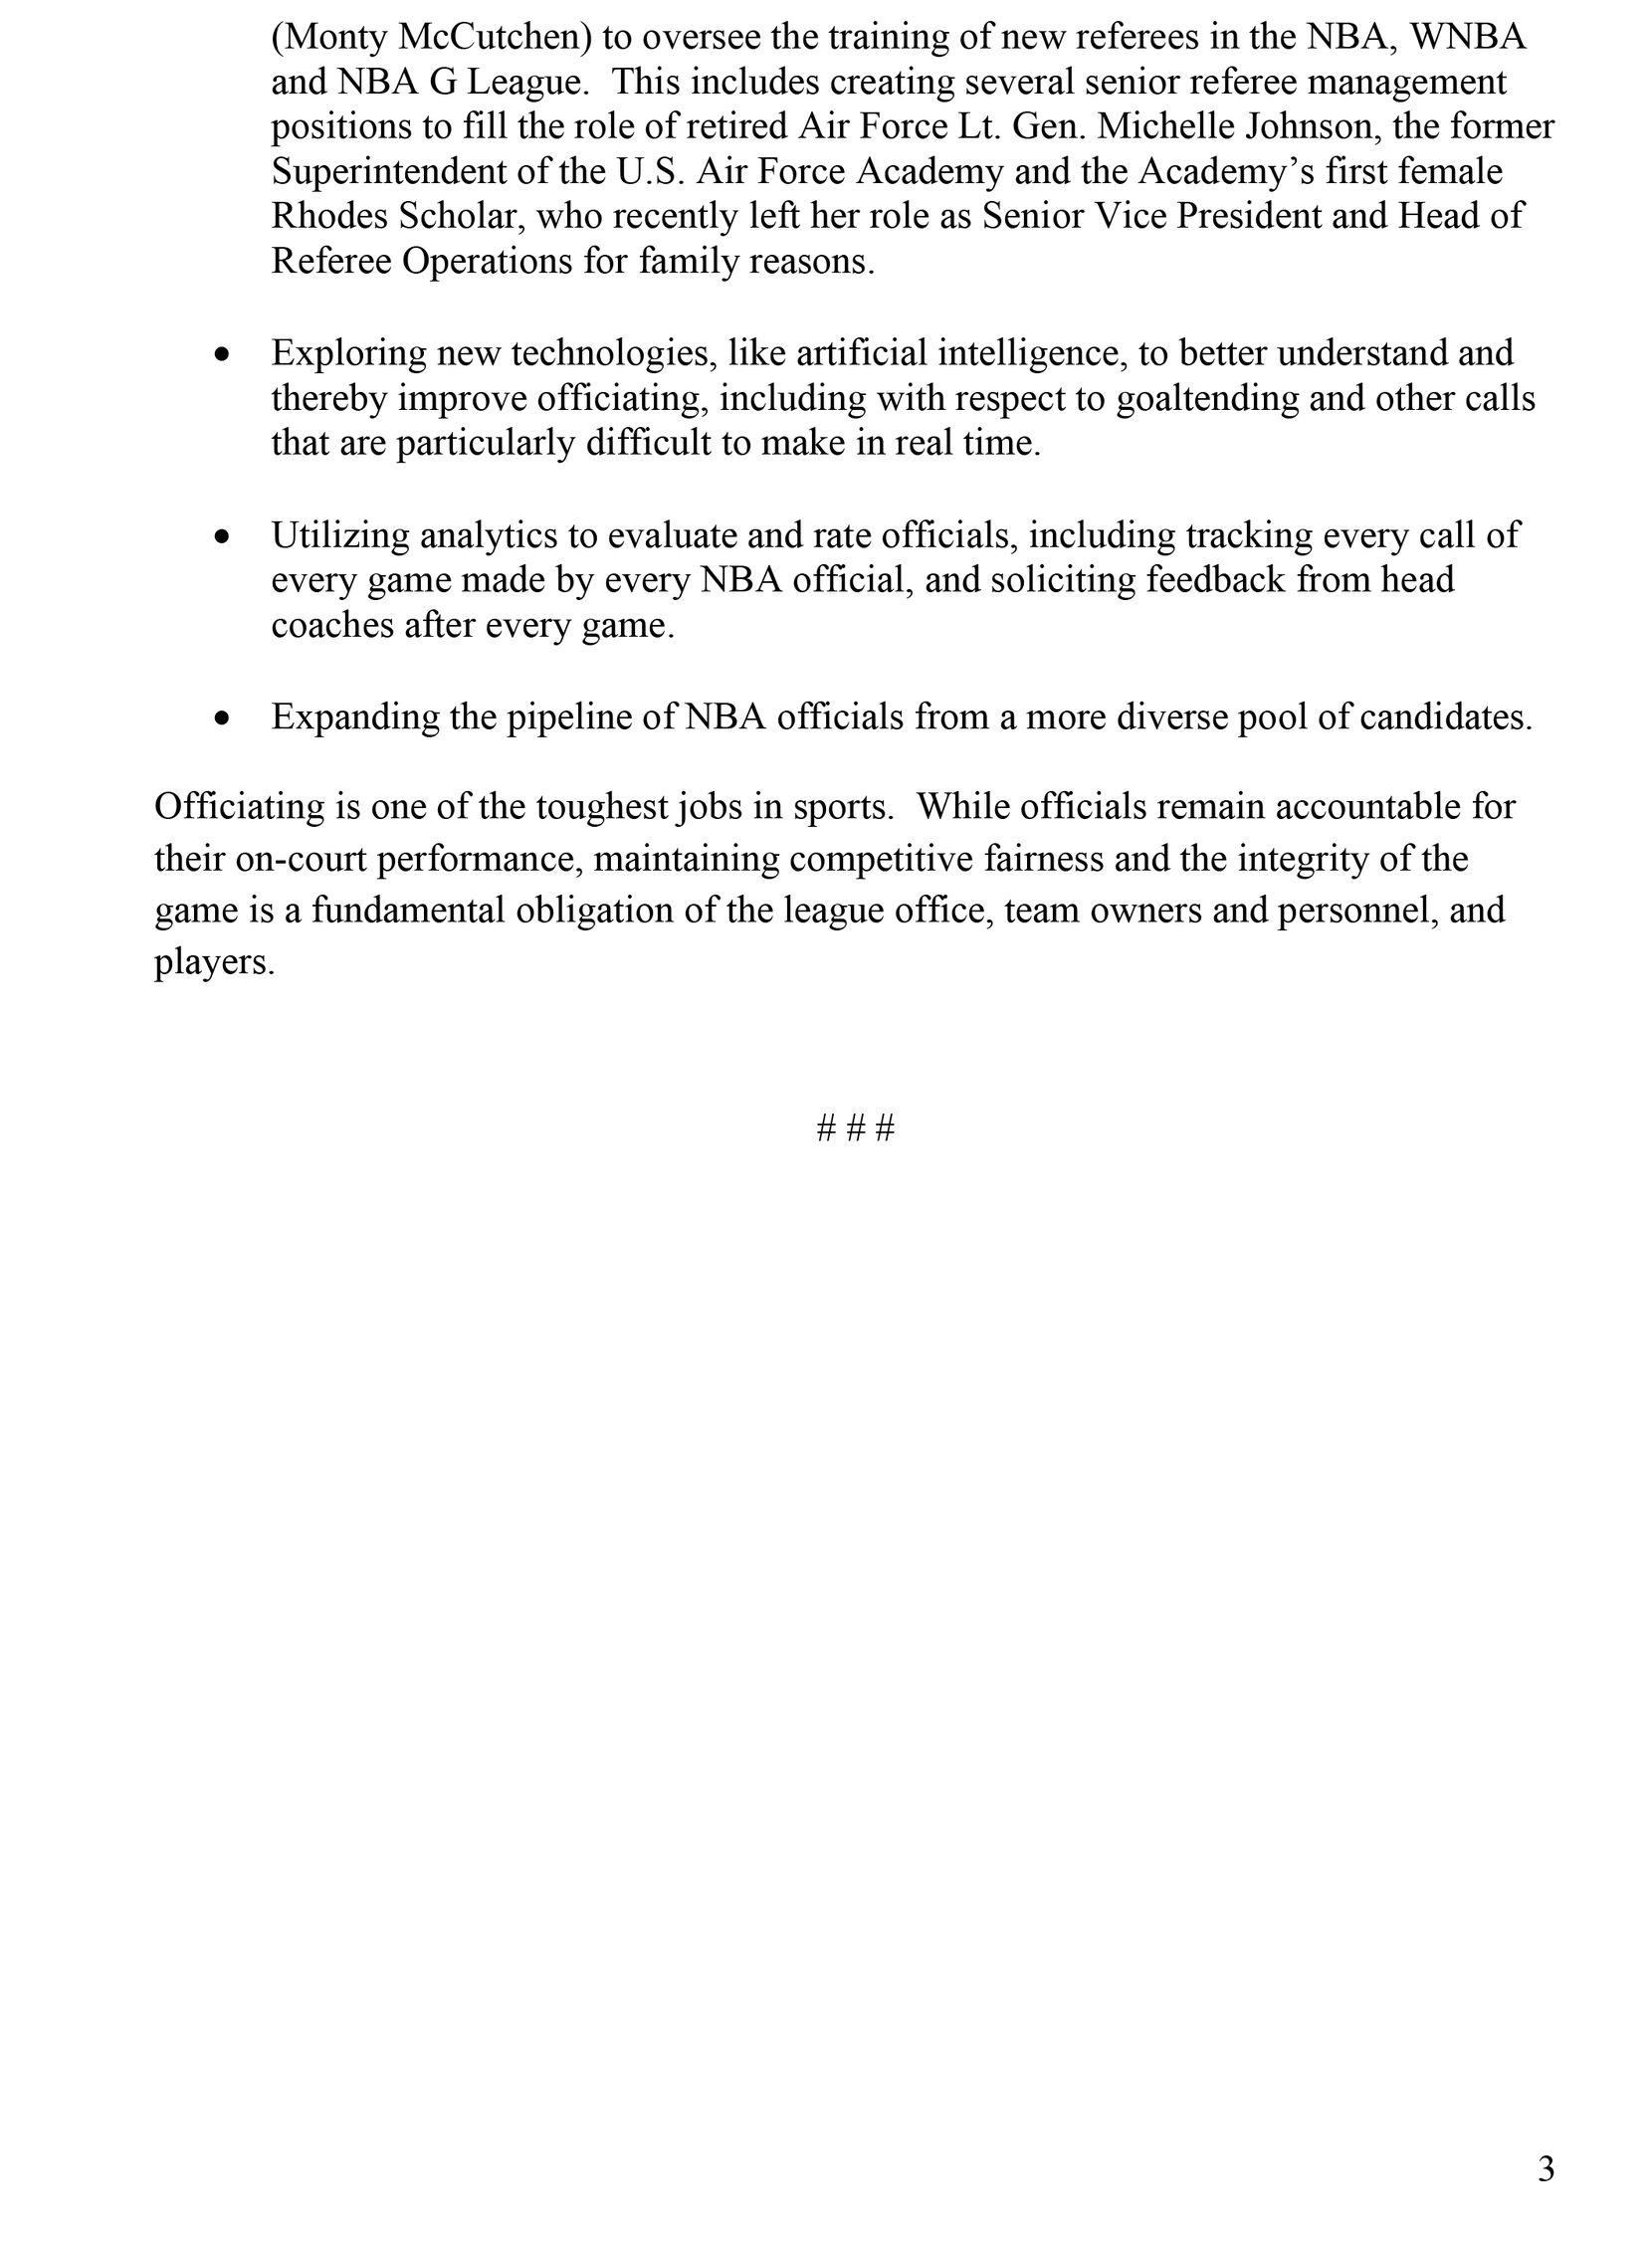 NBA statement on Mavs protest, part 3